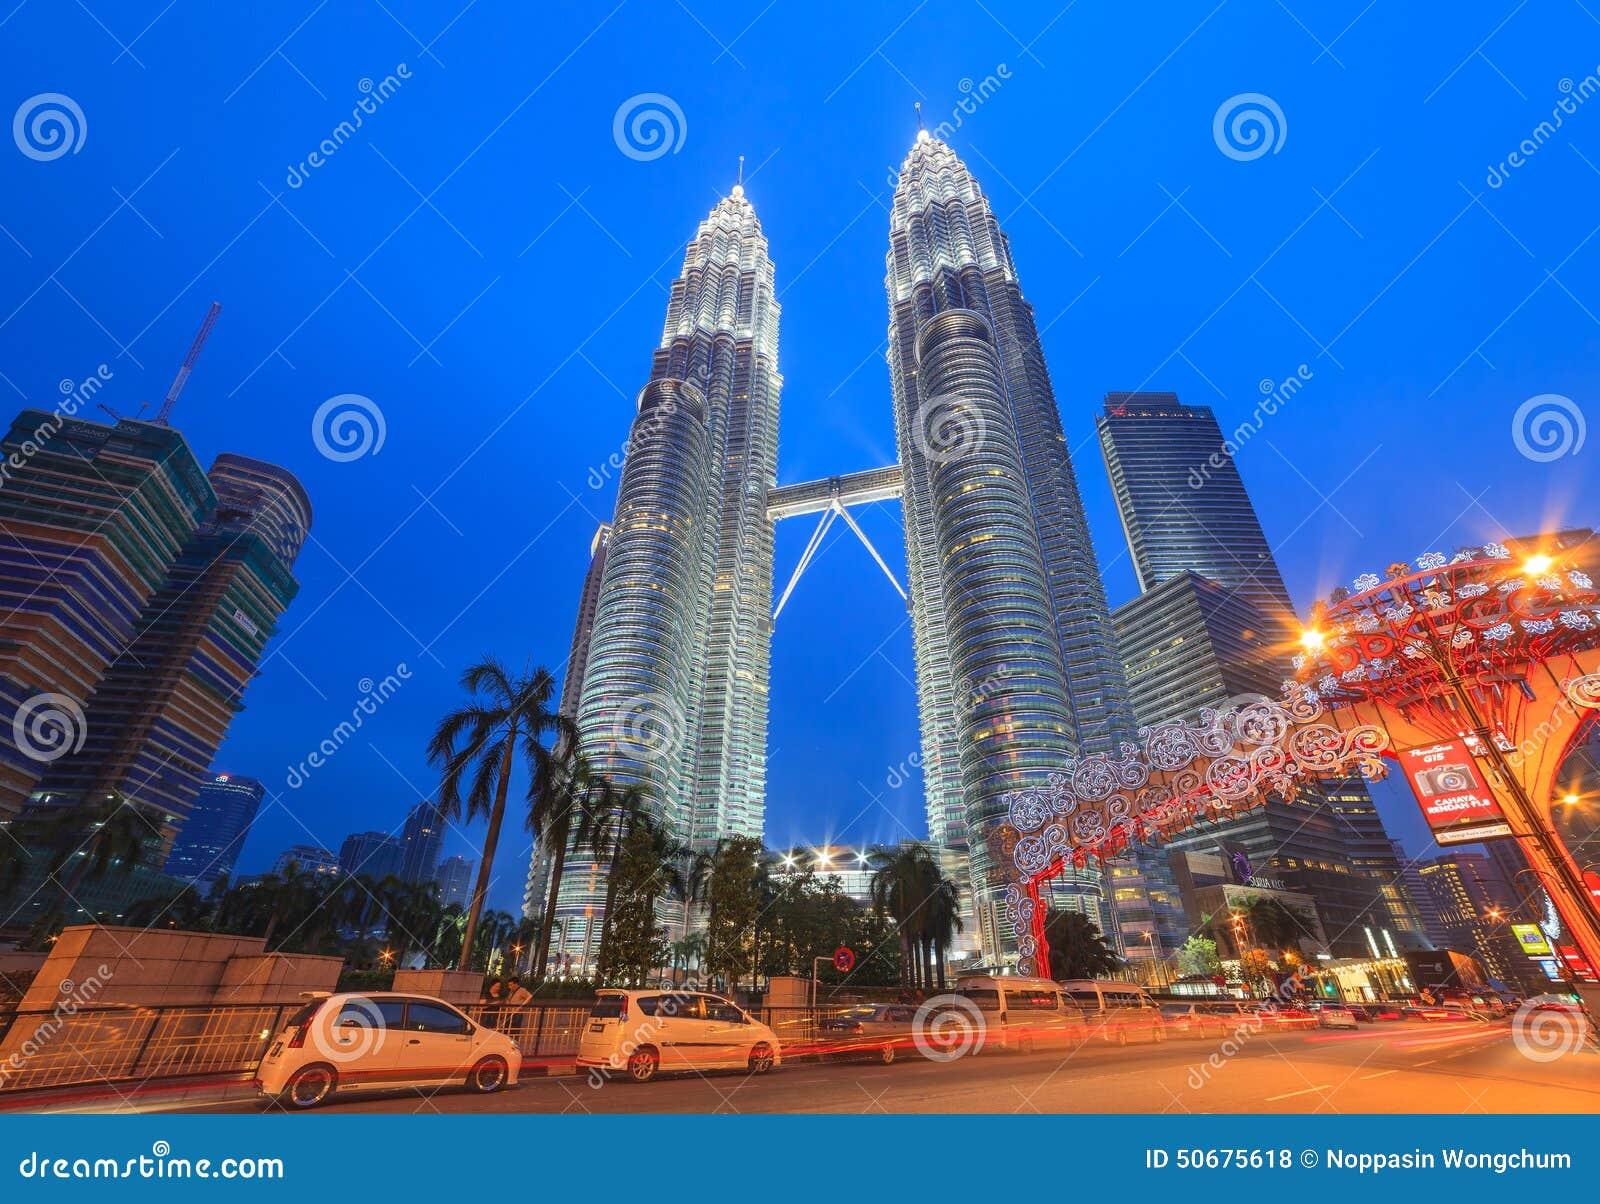 Download 吉隆坡,马来西亚 编辑类库存照片. 图片 包括有 地标, 马来西亚, 现代, 地平线, 孪生, 摩天大楼 - 50675618